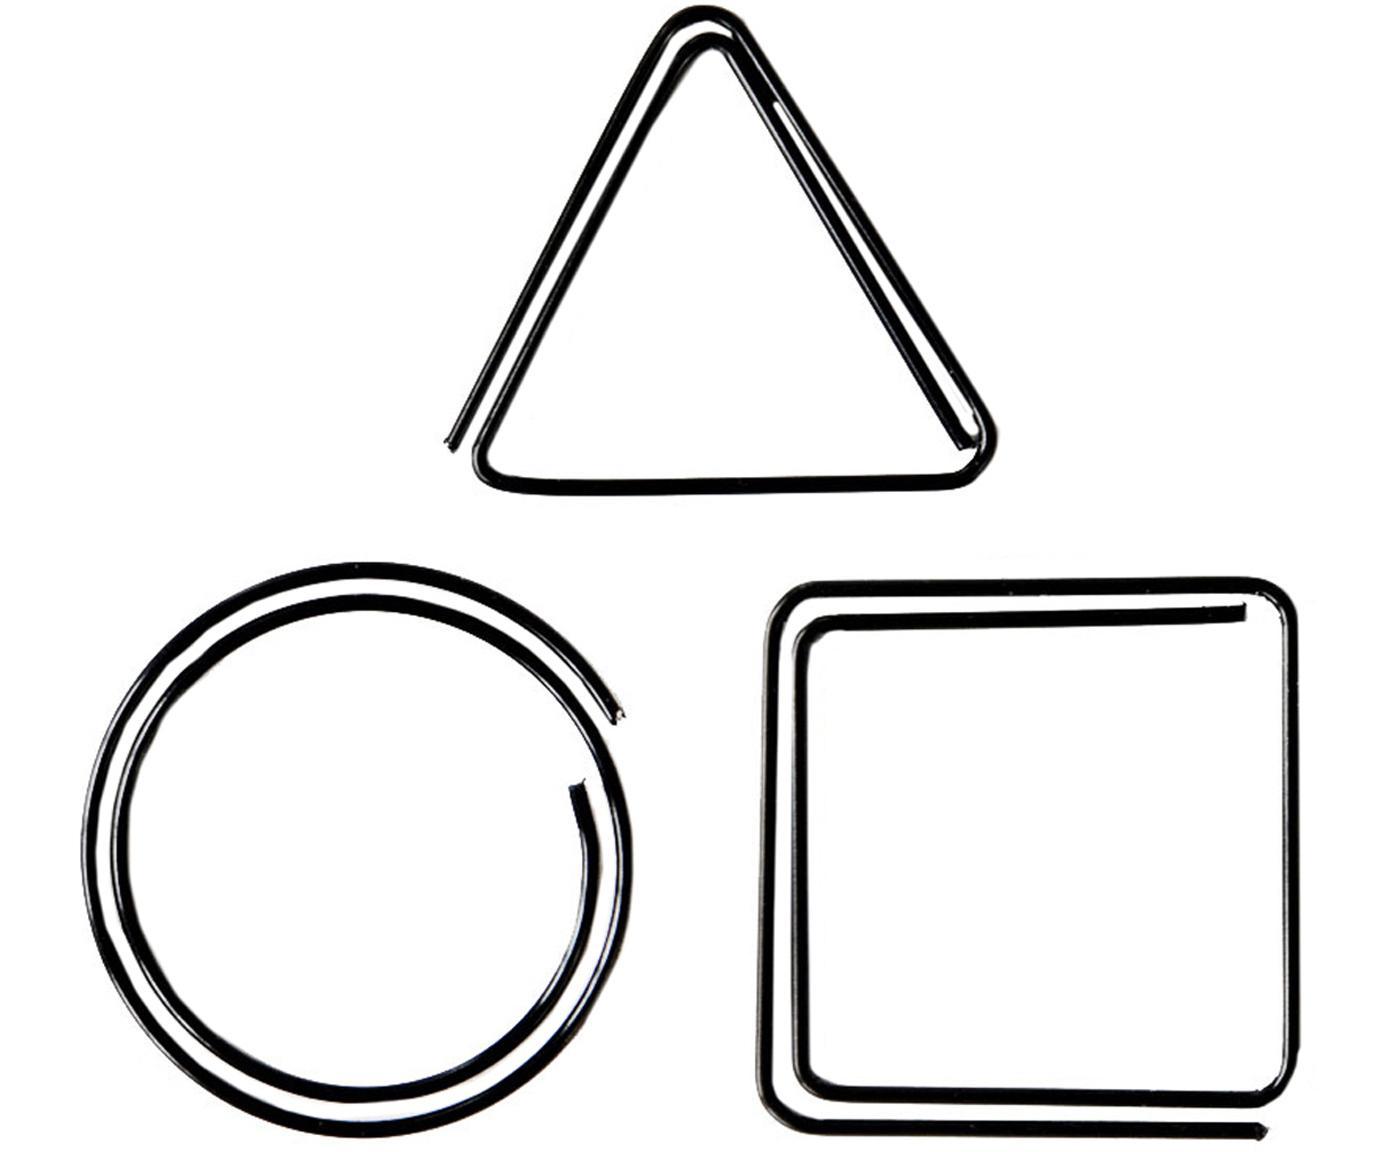 Set di graffette Geometria, 9 pz., Metallo verniciato, Nero, Larg. 3 x Alt. 3 cm